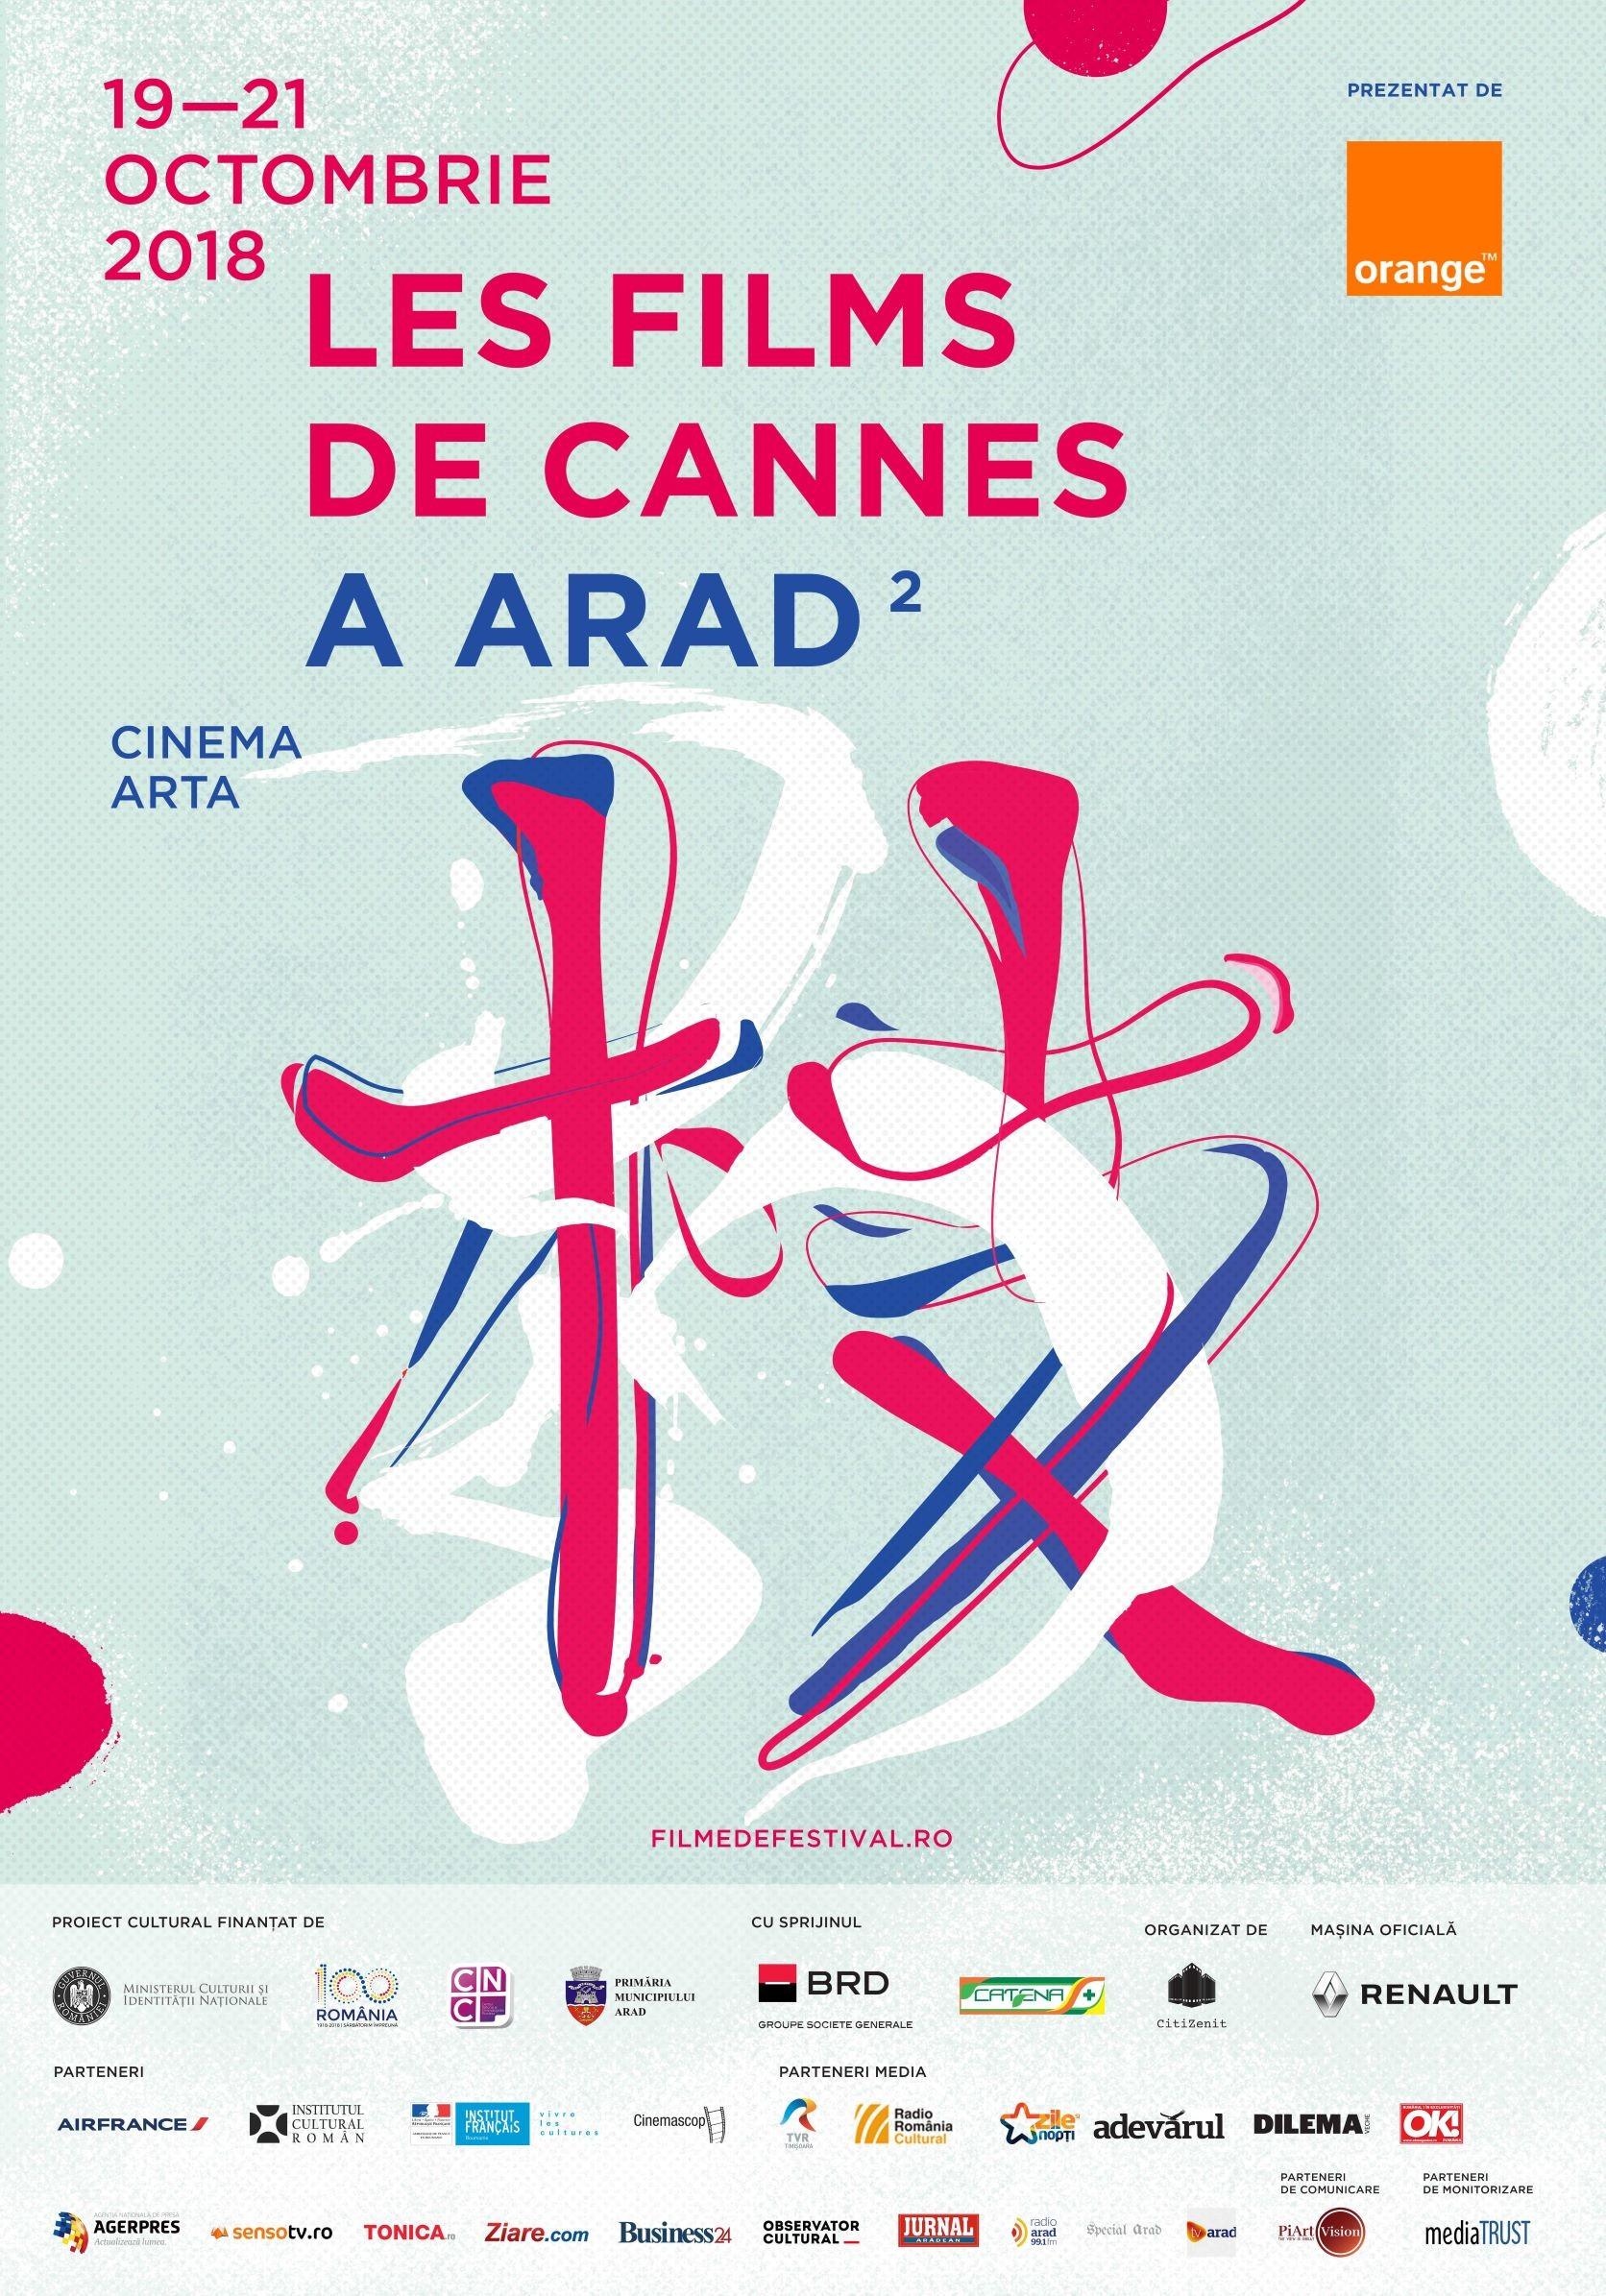 Les films de Cannes se întoarce la Arad